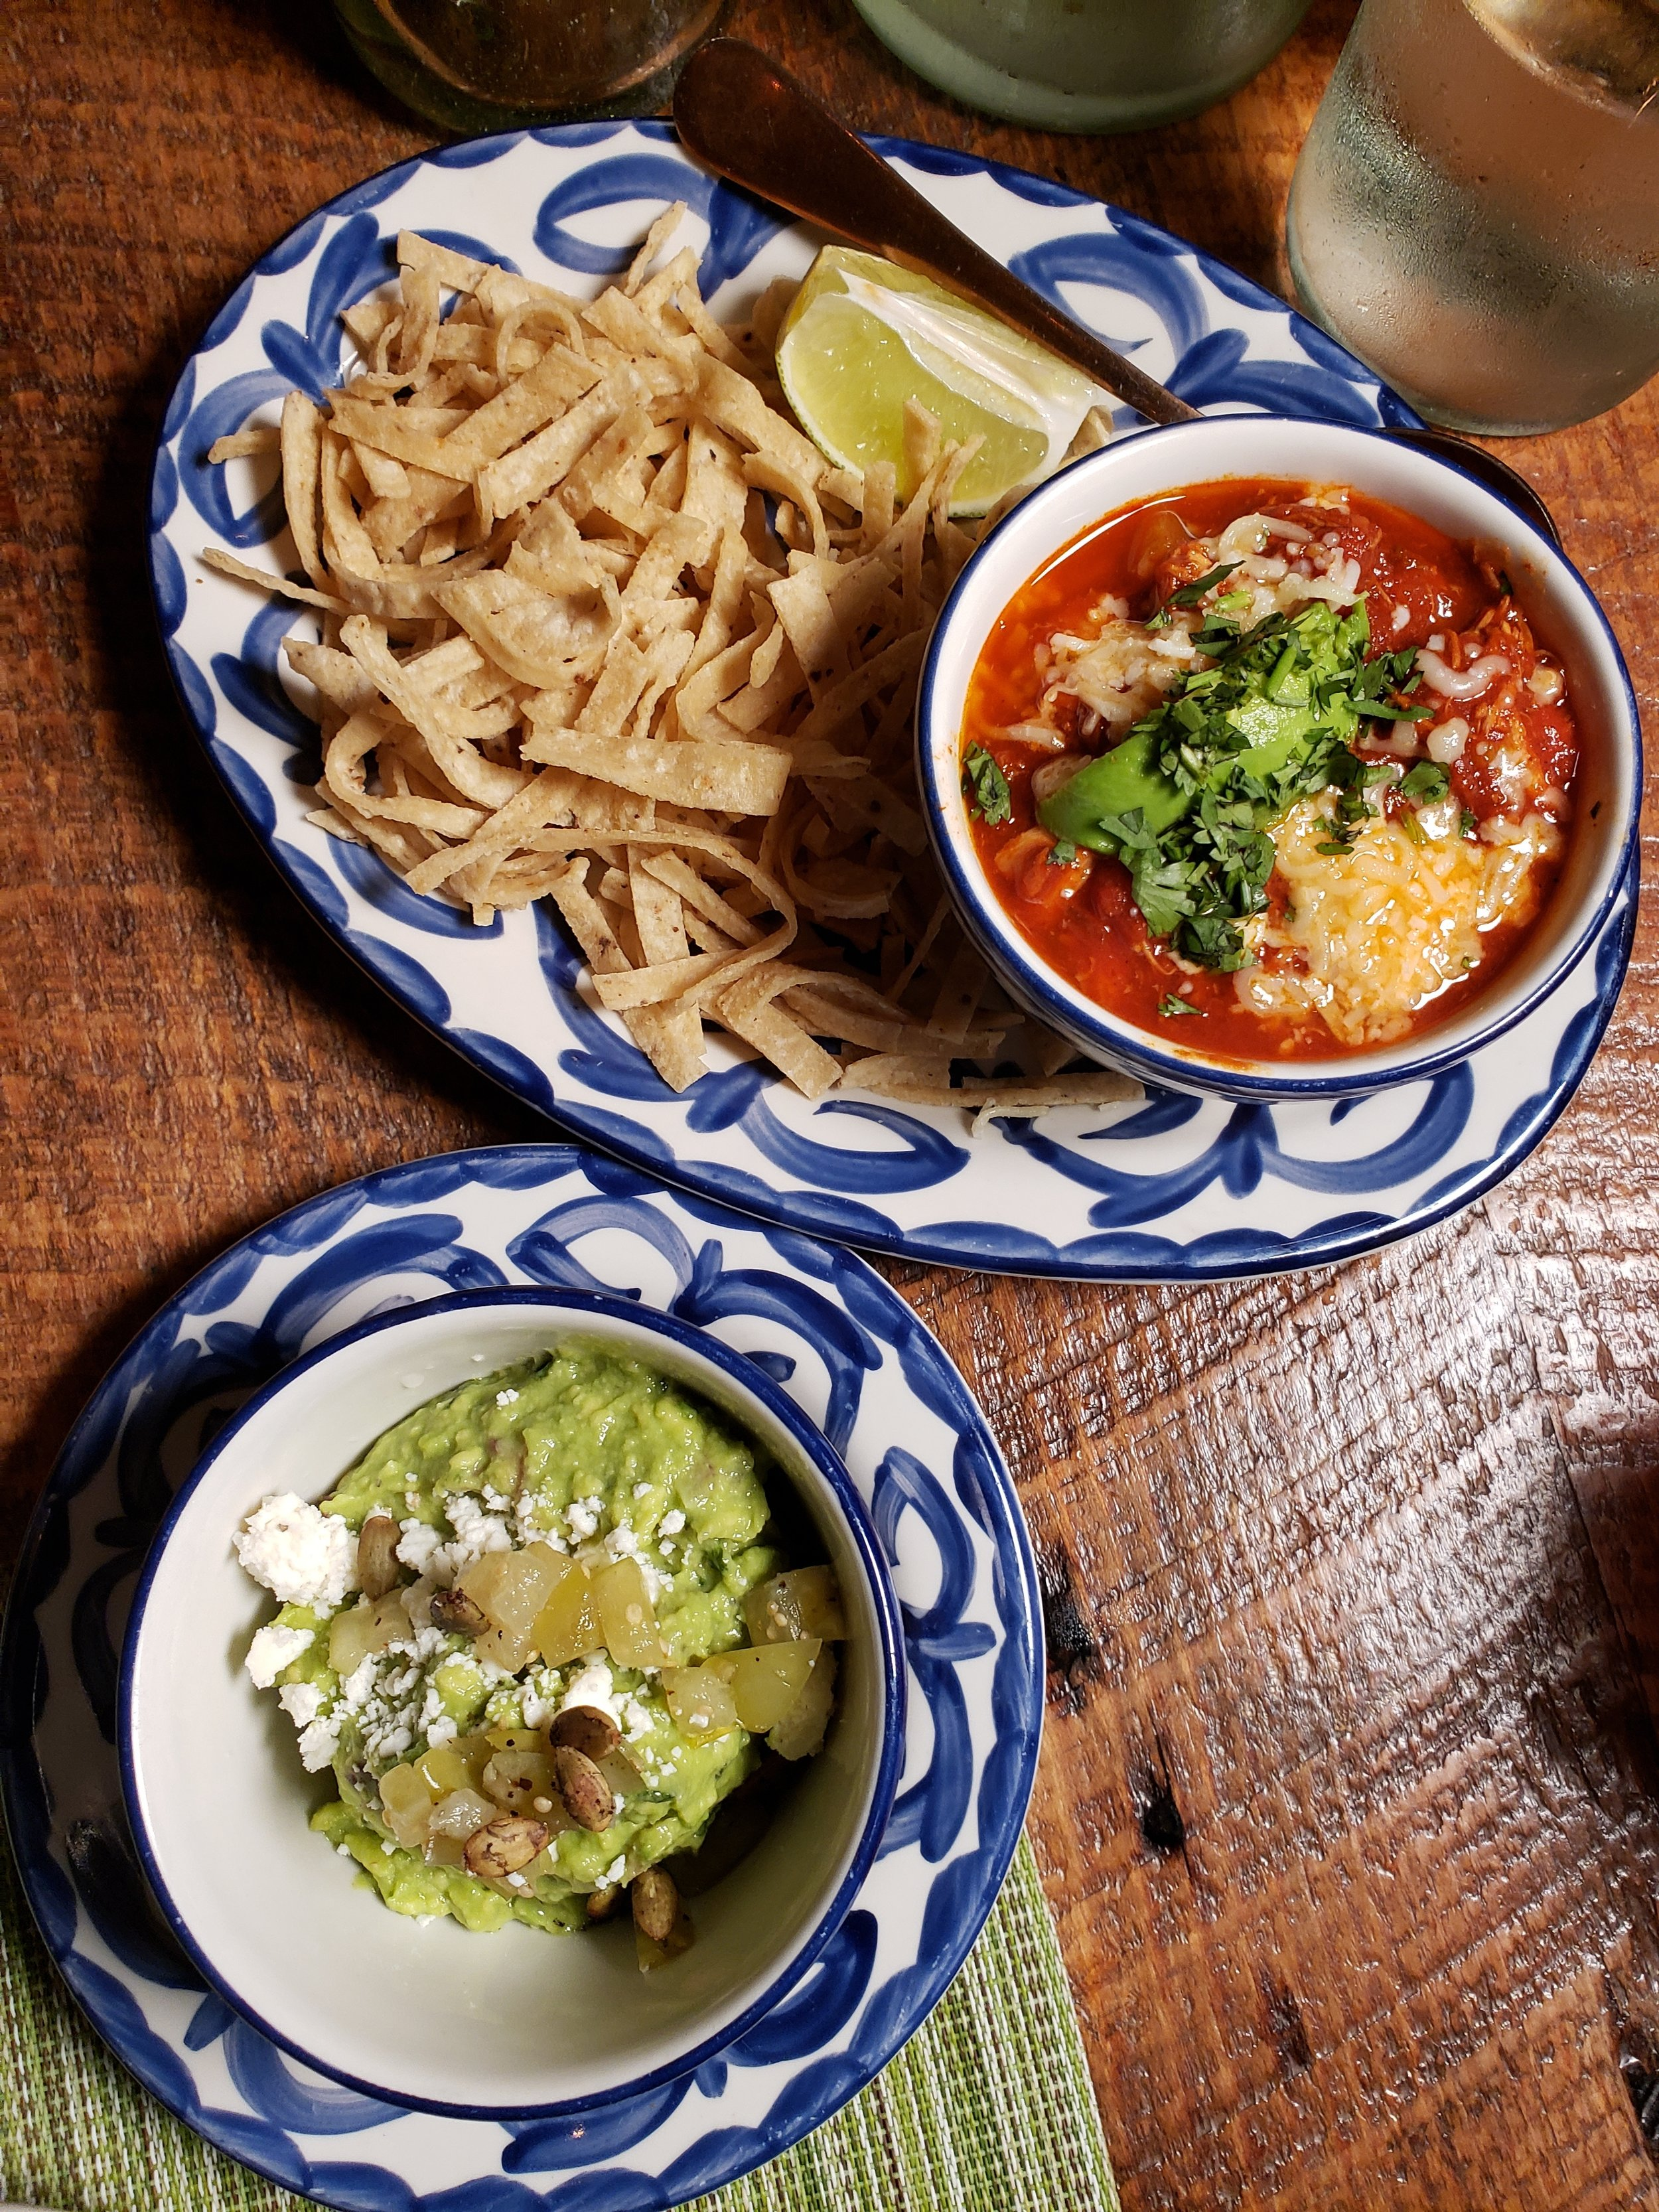 Tortilla Soup and Guacamole